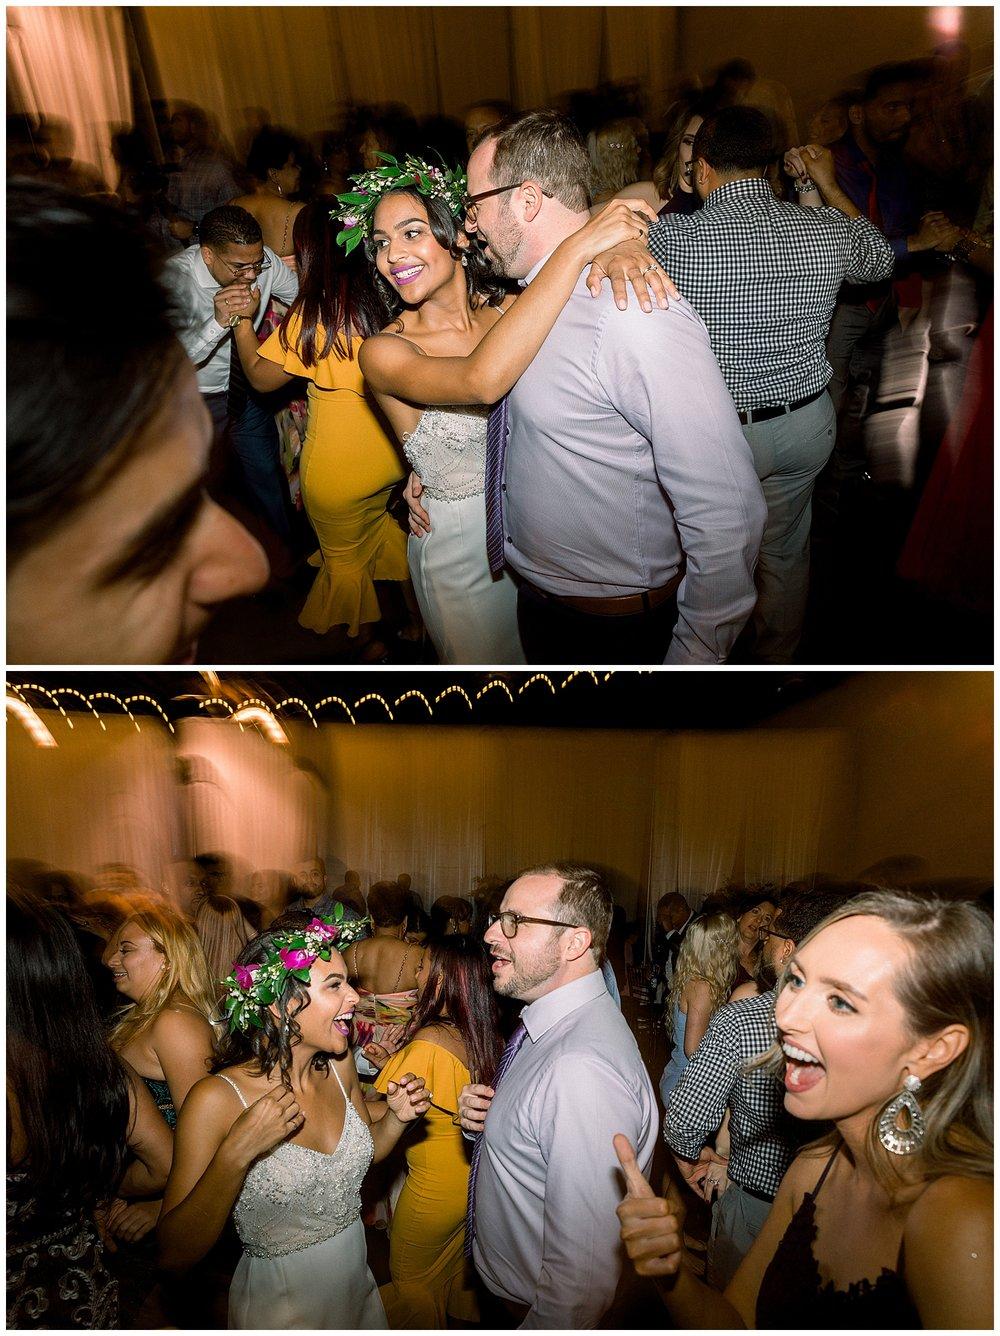 jessicafredericks_lakeland_tampa_wedding_purple_crazy hour_0085.jpg